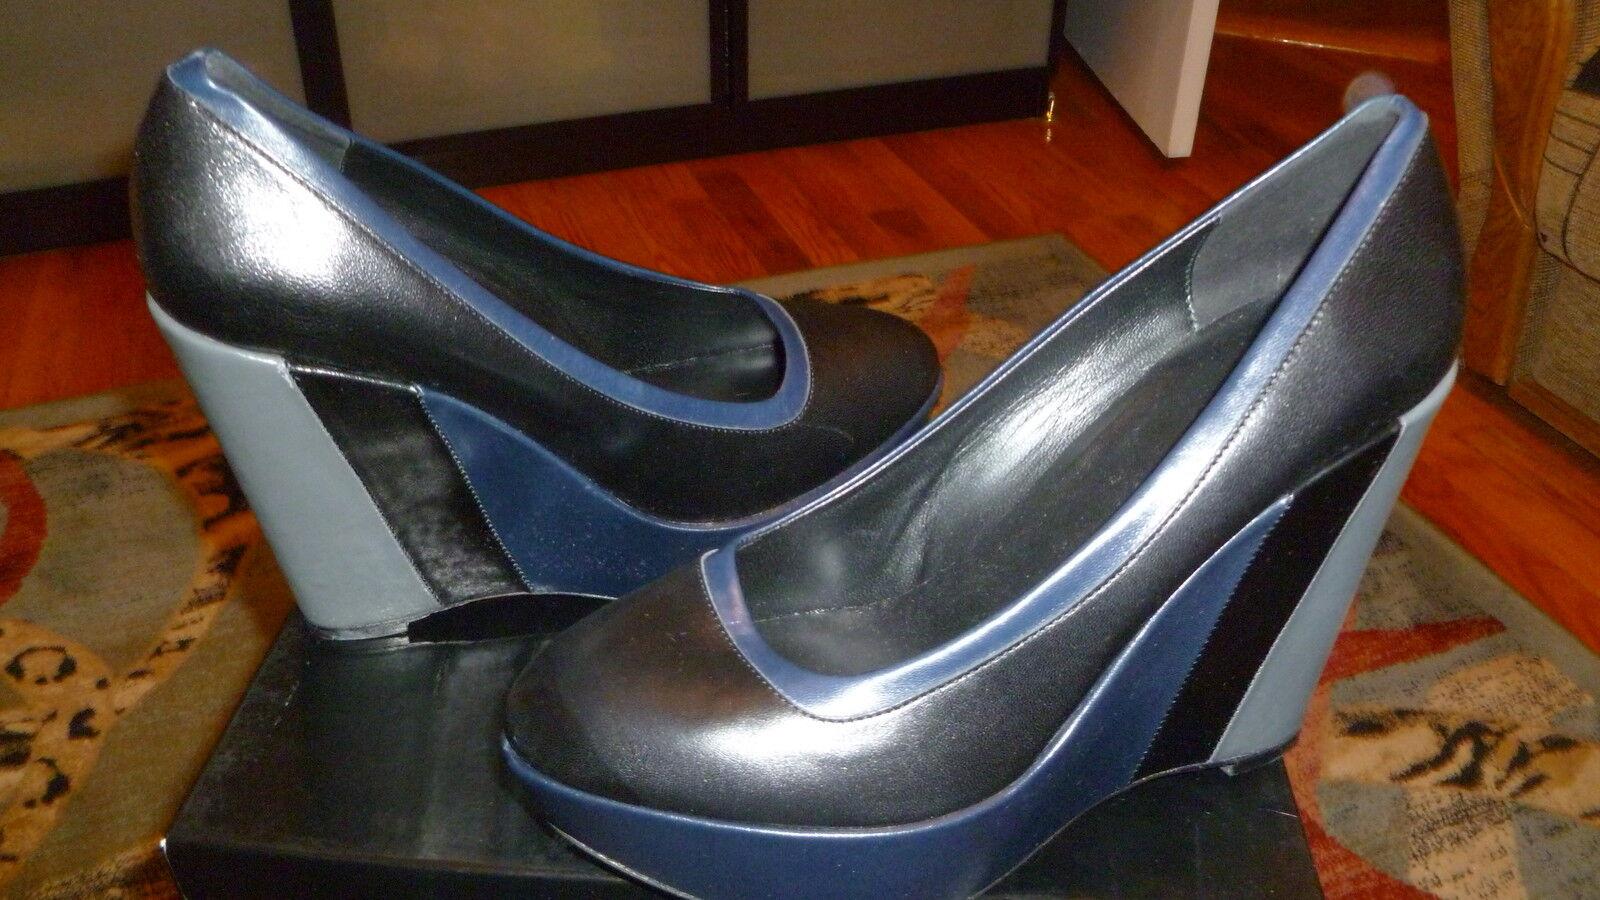 NIB Escada Sport High Heel Platform Wedges Black Leather Shoes size 40 US 10.